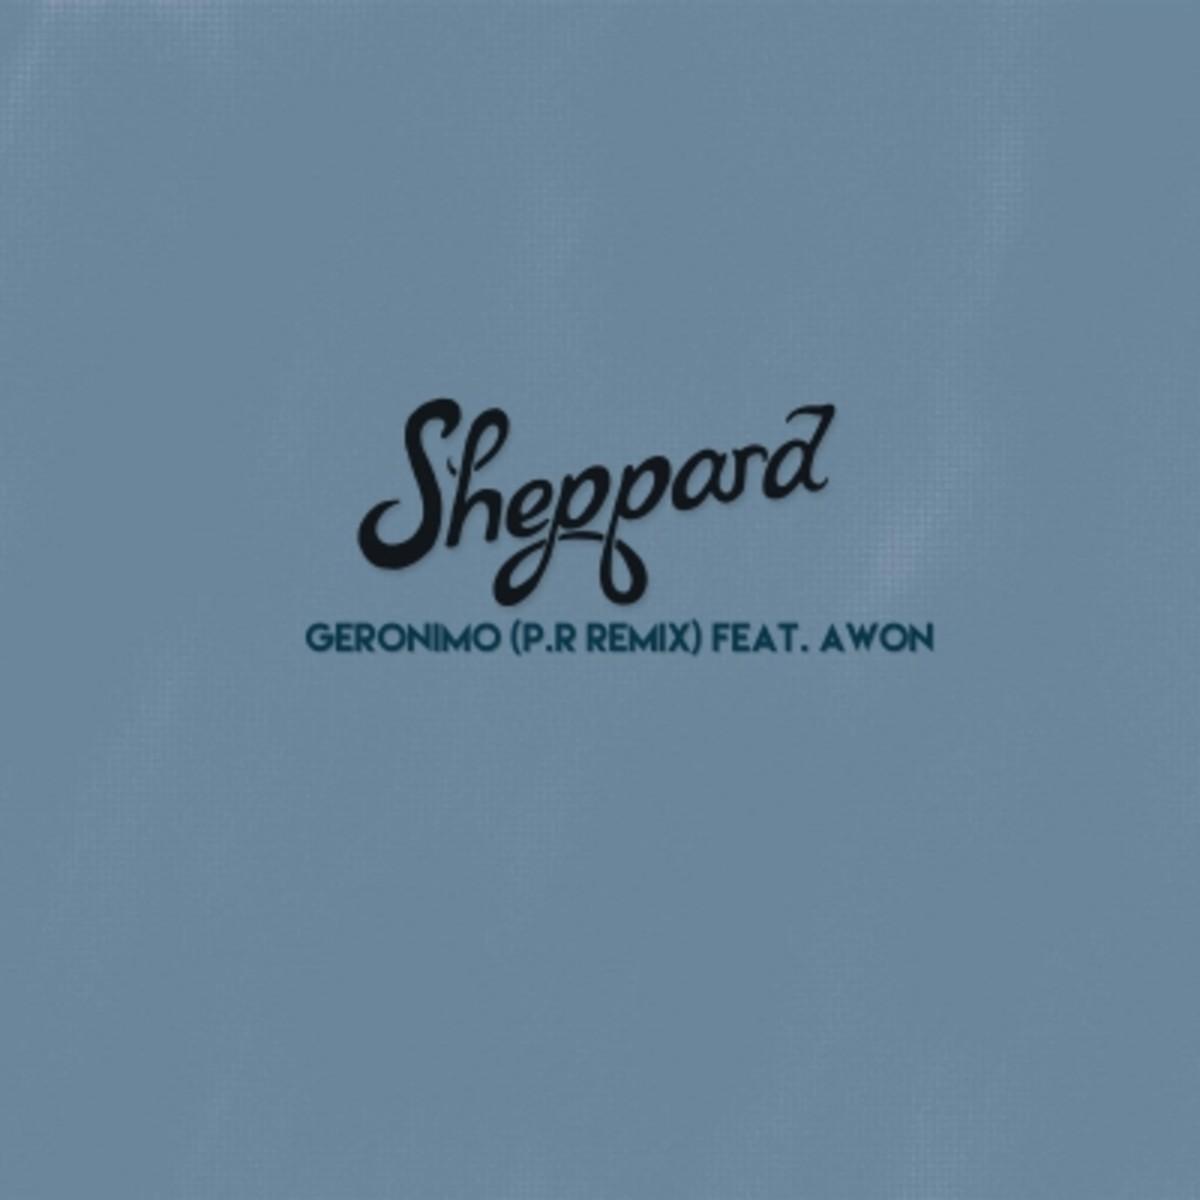 sheppard-geronimo-pr-remix.jpg